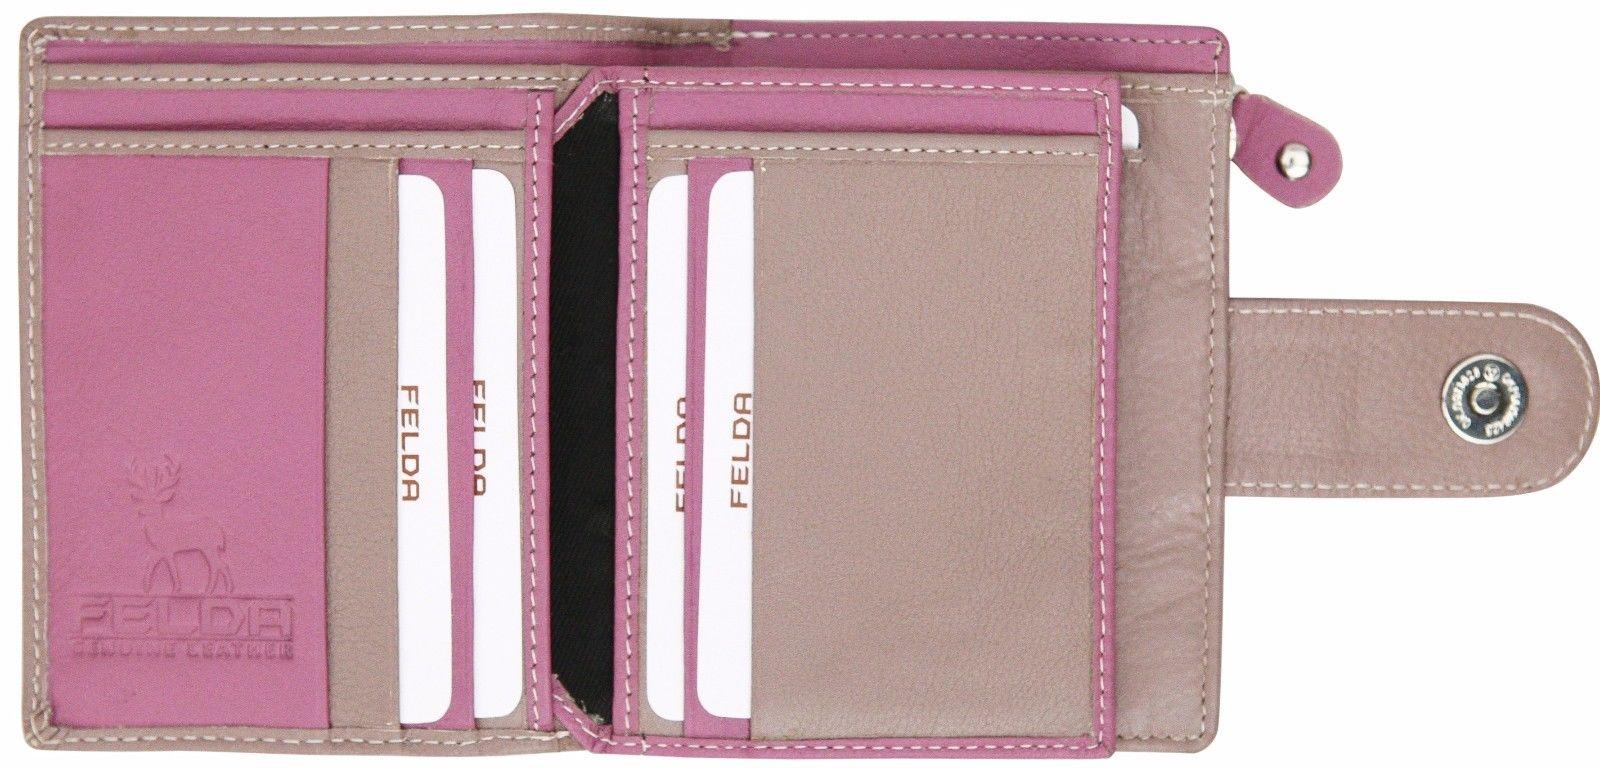 Felda-RFID-onorevoli-MEDAGLIA-amp-Card-Purse-Wallet-Genuine-Leather-Multi-SOFT-BOX-REGALO miniatura 83